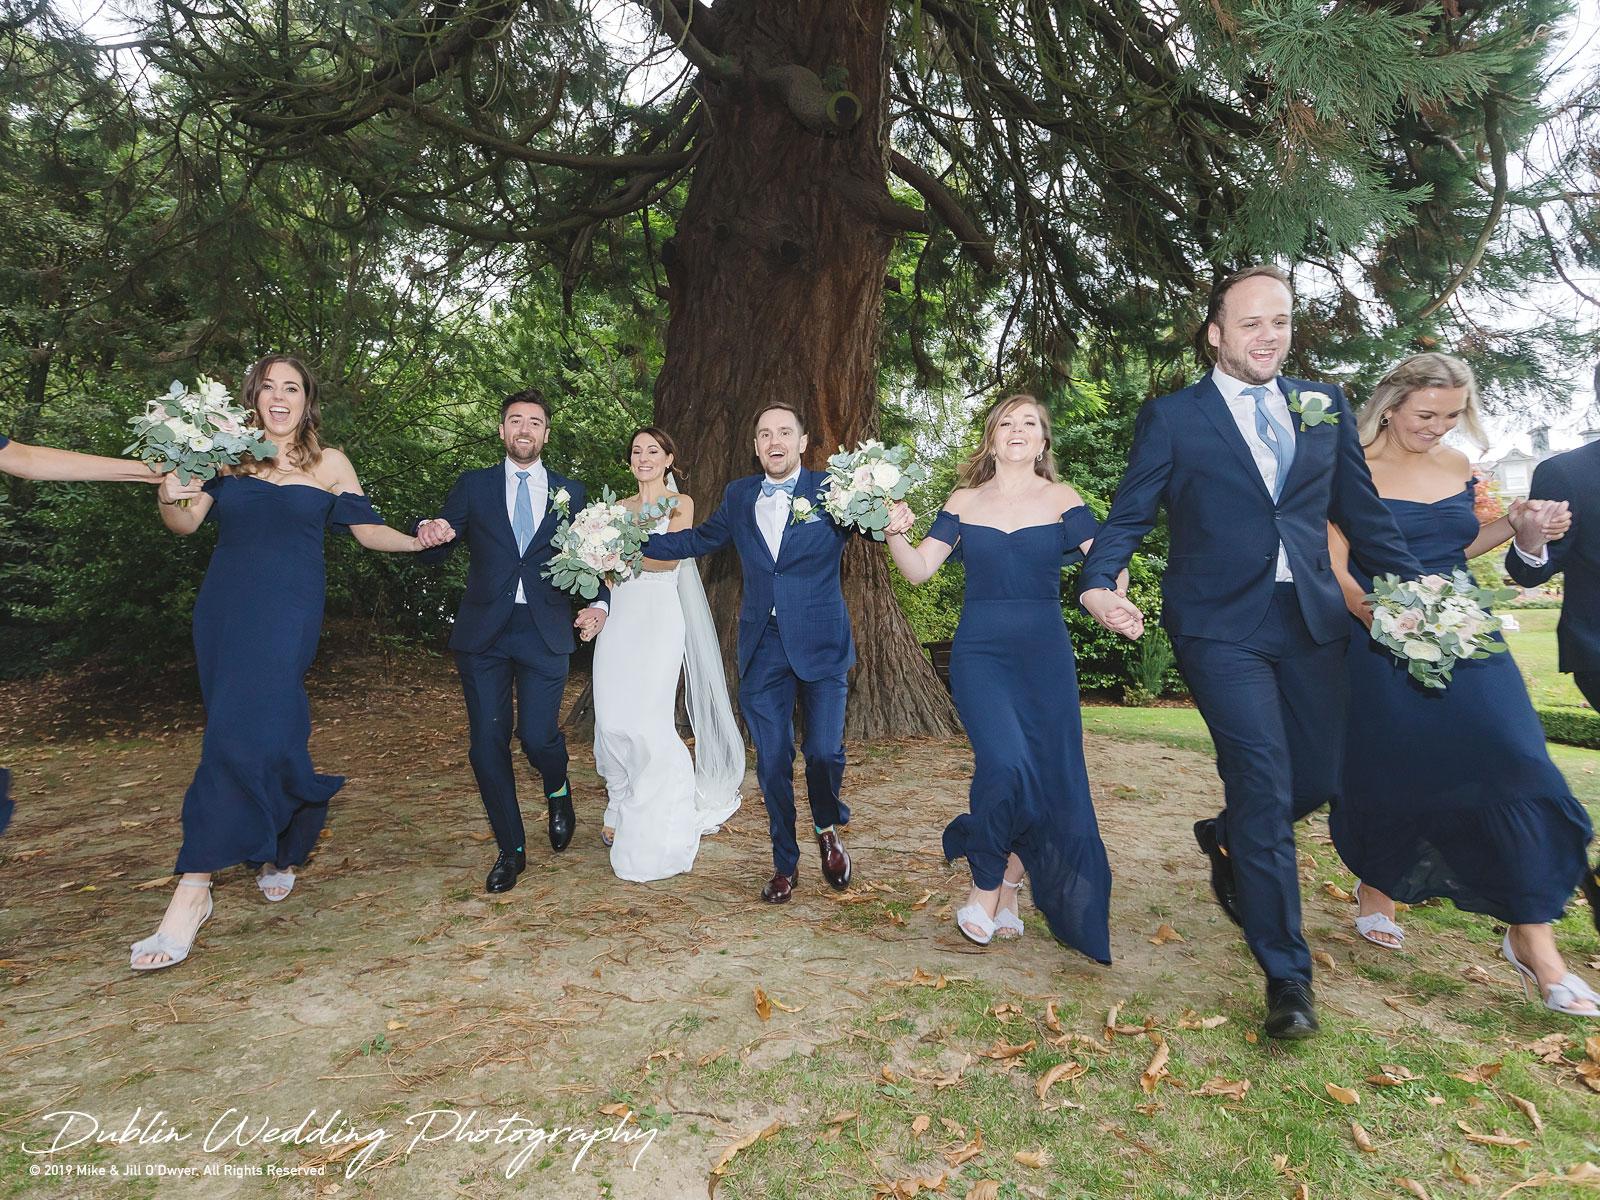 wedding-photographers-wicklow-tinakilly-house-2019-52.jpg